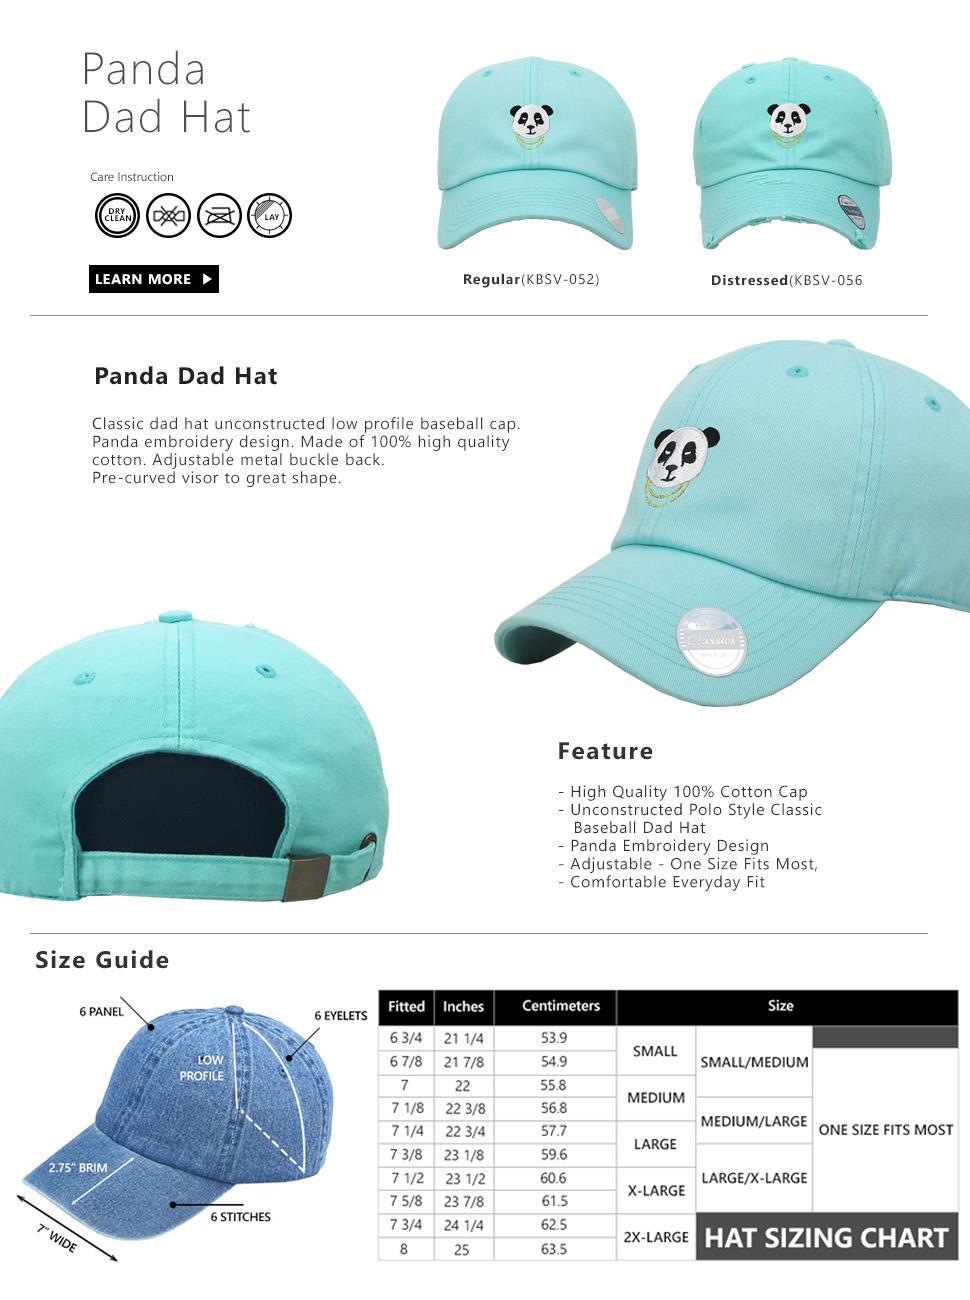 f2310316cc4 KBSV-056 BLK Panda Vintage Distressed Dad Hat Baseball Cap Polo ...